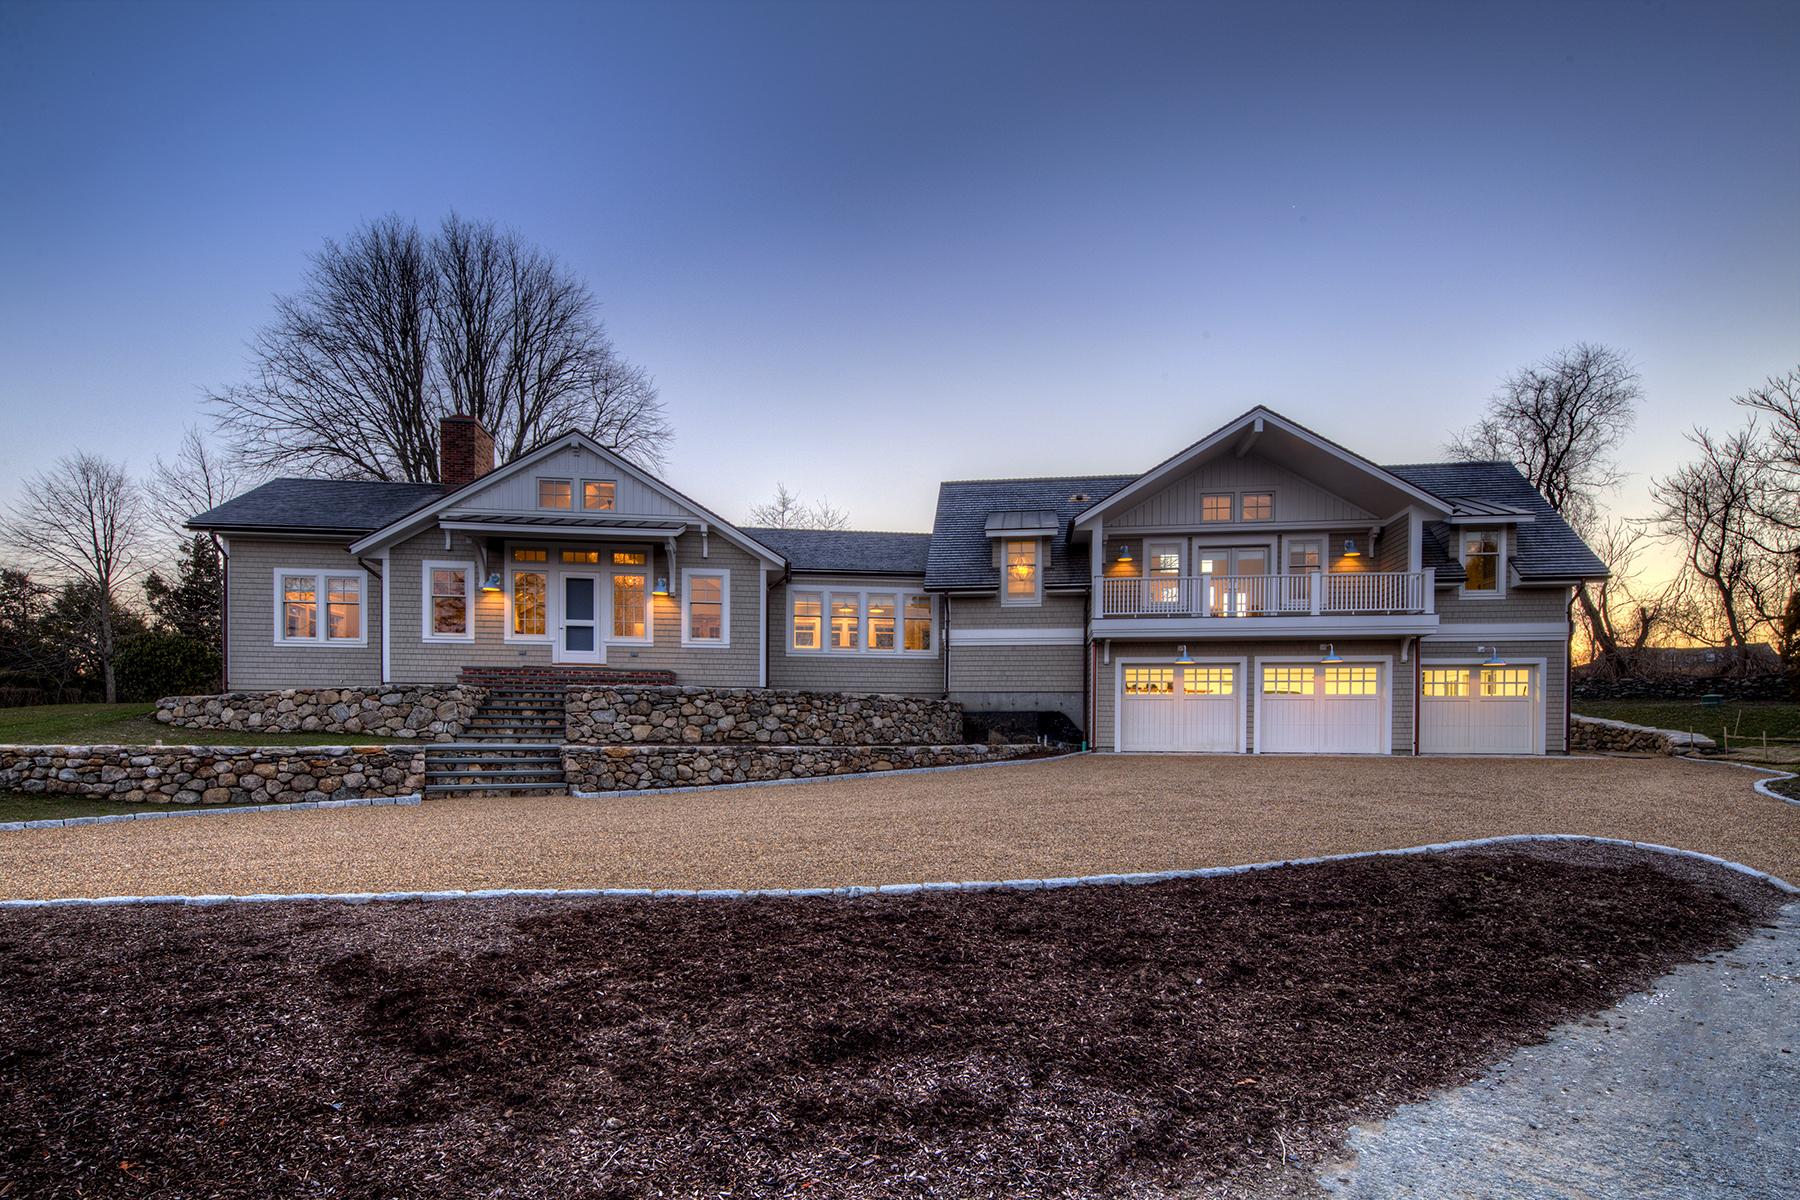 واحد منزل الأسرة للـ Sale في Indian Avenue 314 Indian Avenue Middletown, Rhode Island 02842 United States